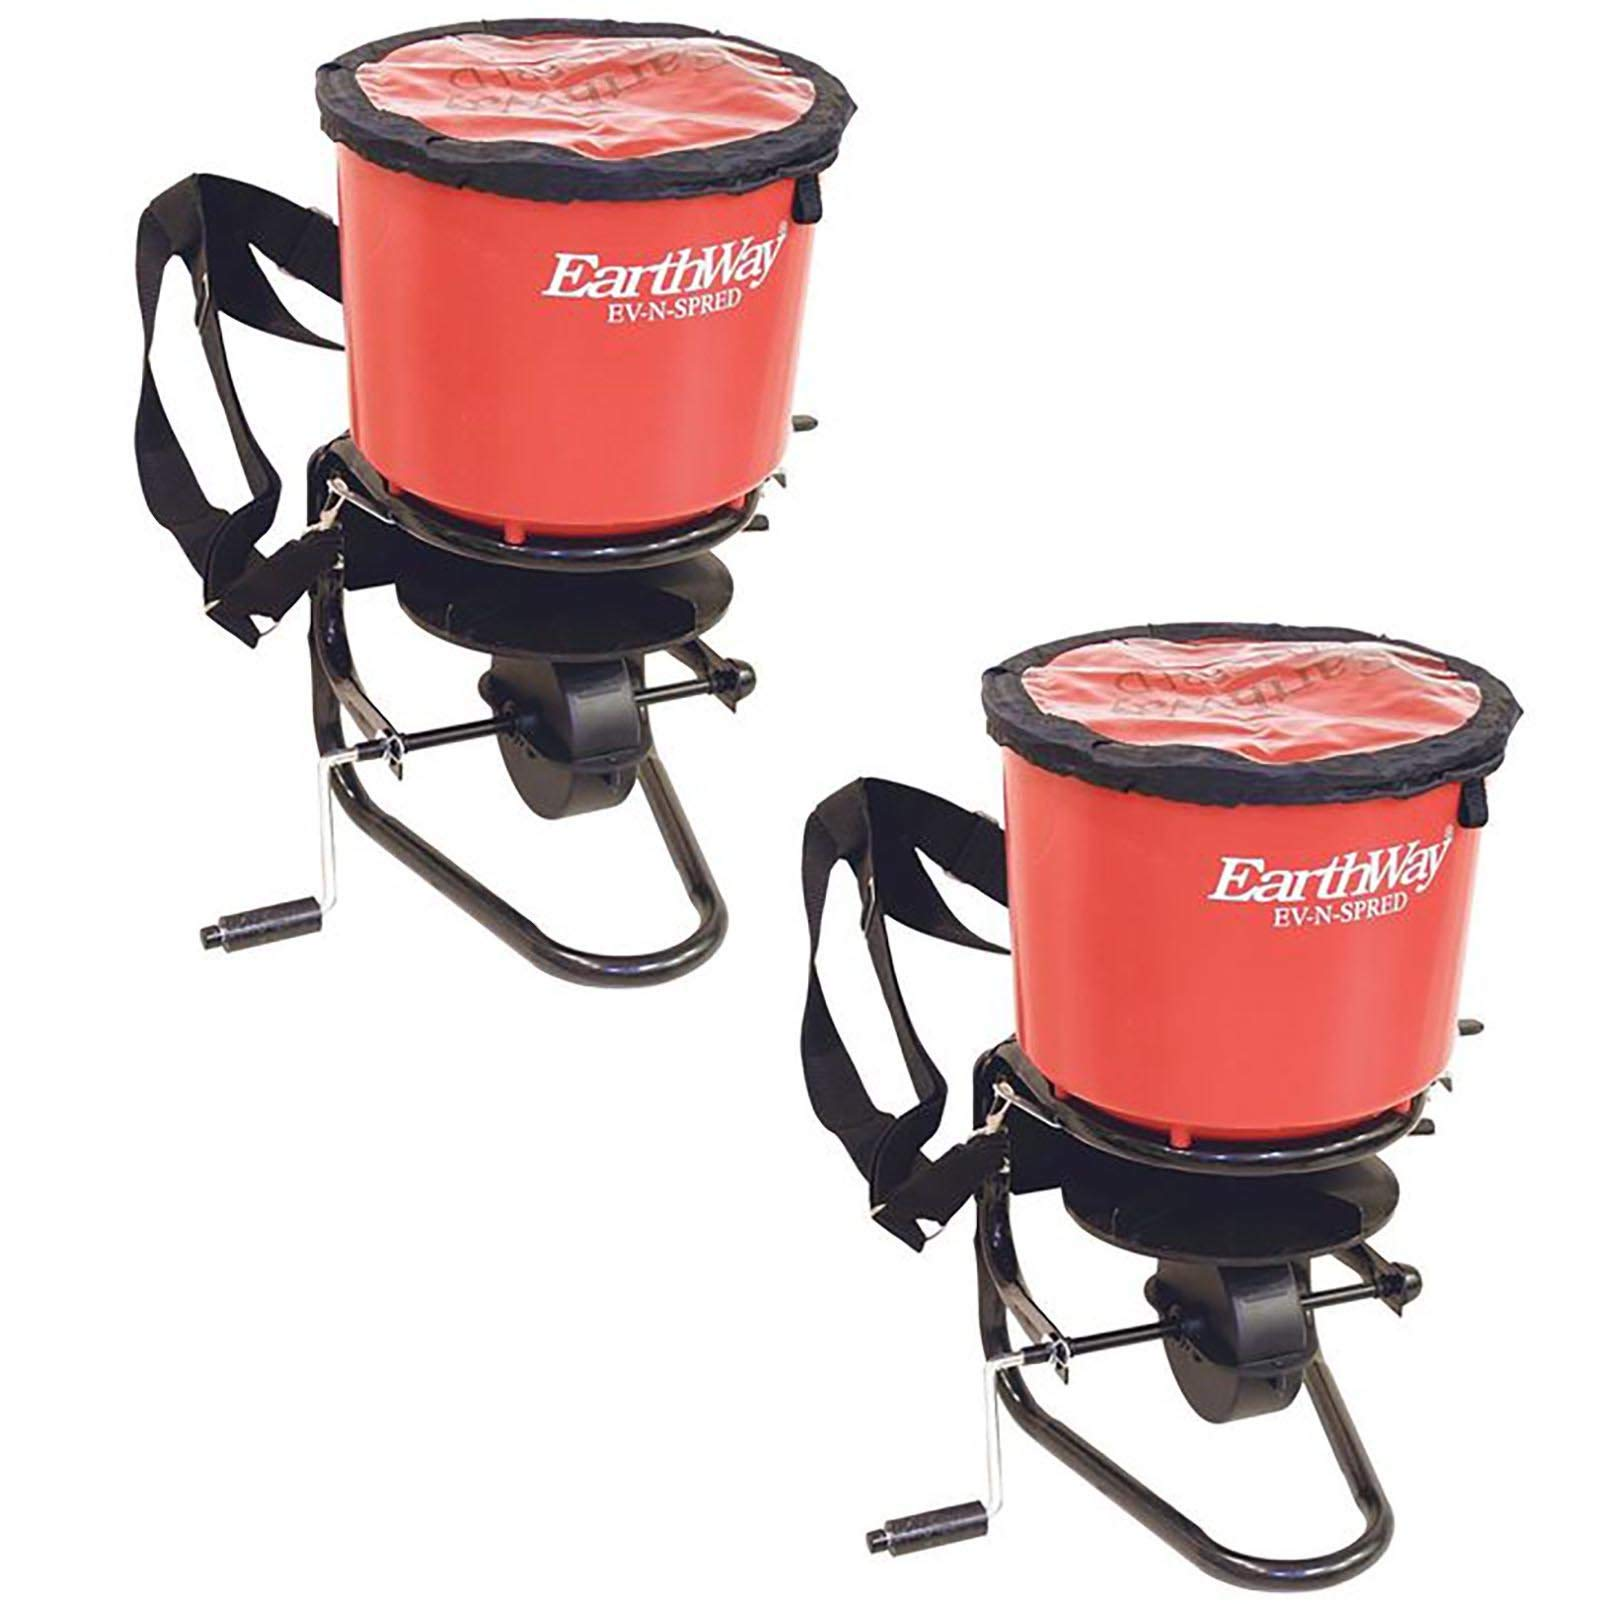 Earthway 3100 Hand Crank Garden Seeder Adaptable Seed and Fertilizer Spreader (2 Pack)